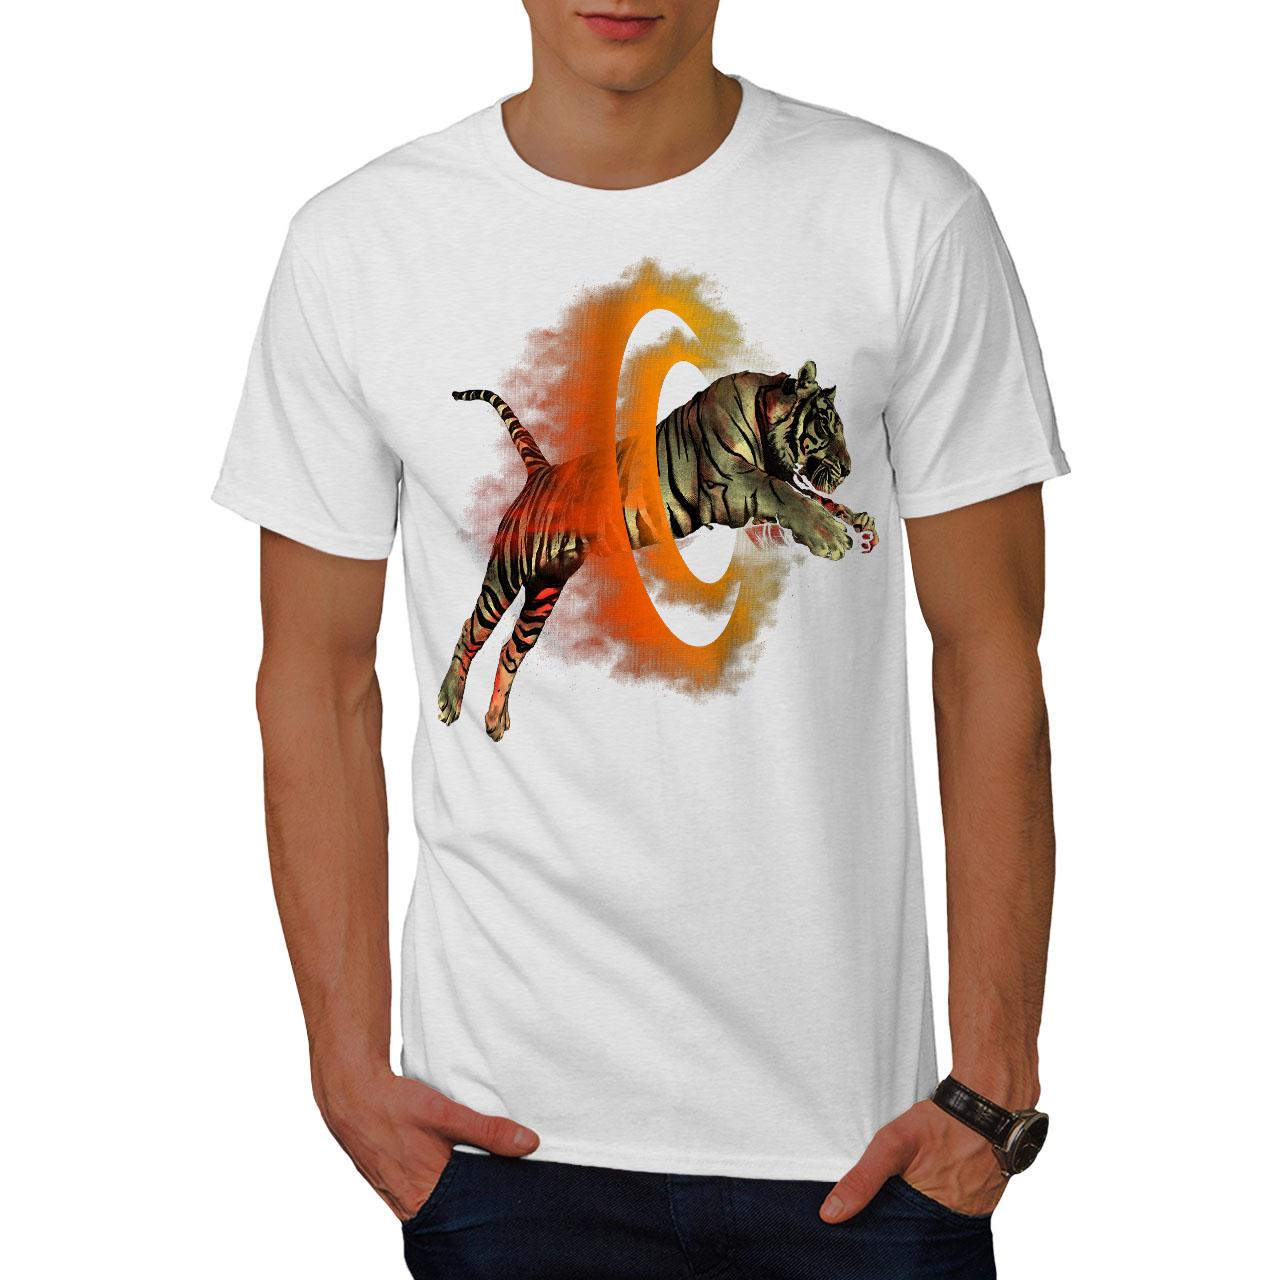 Wellcoda-Tiger-Portal-Cool-Mens-T-shirt-Flame-Graphic-Design-Printed-Tee thumbnail 9